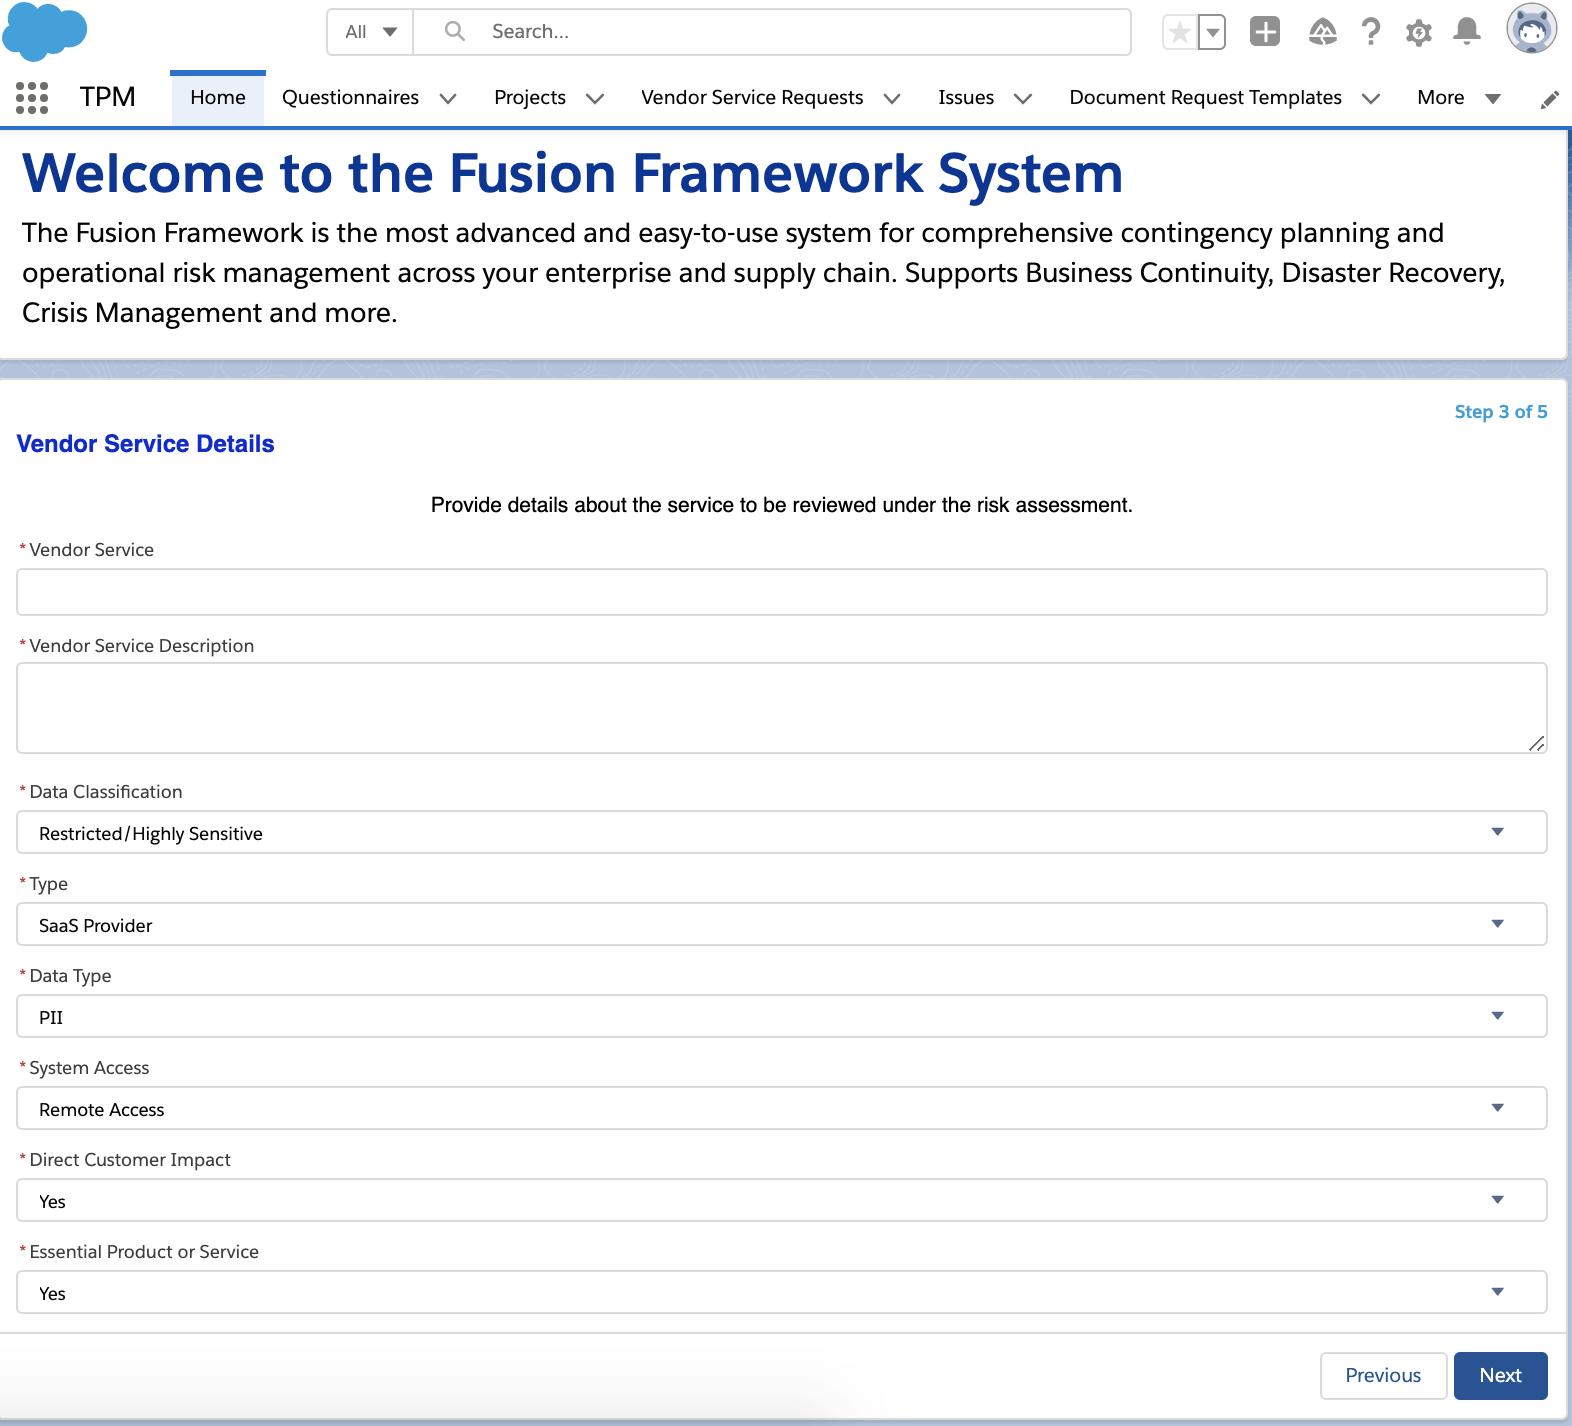 Screenshot of vendor service details